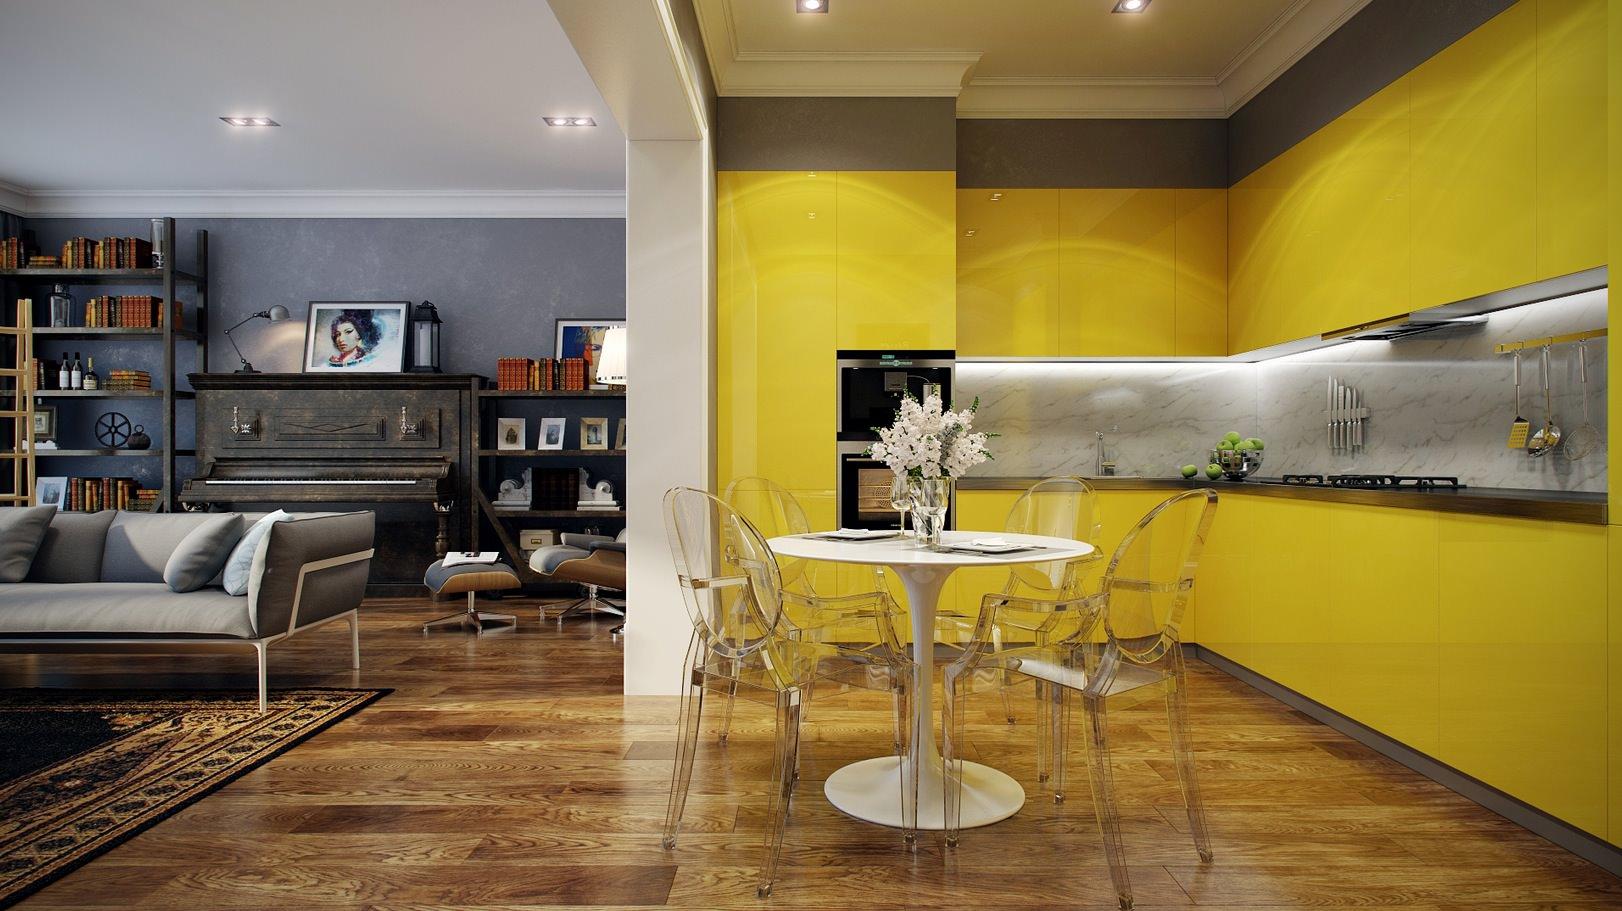 «Руфина» (11) лофт, угловая, студия, желтый